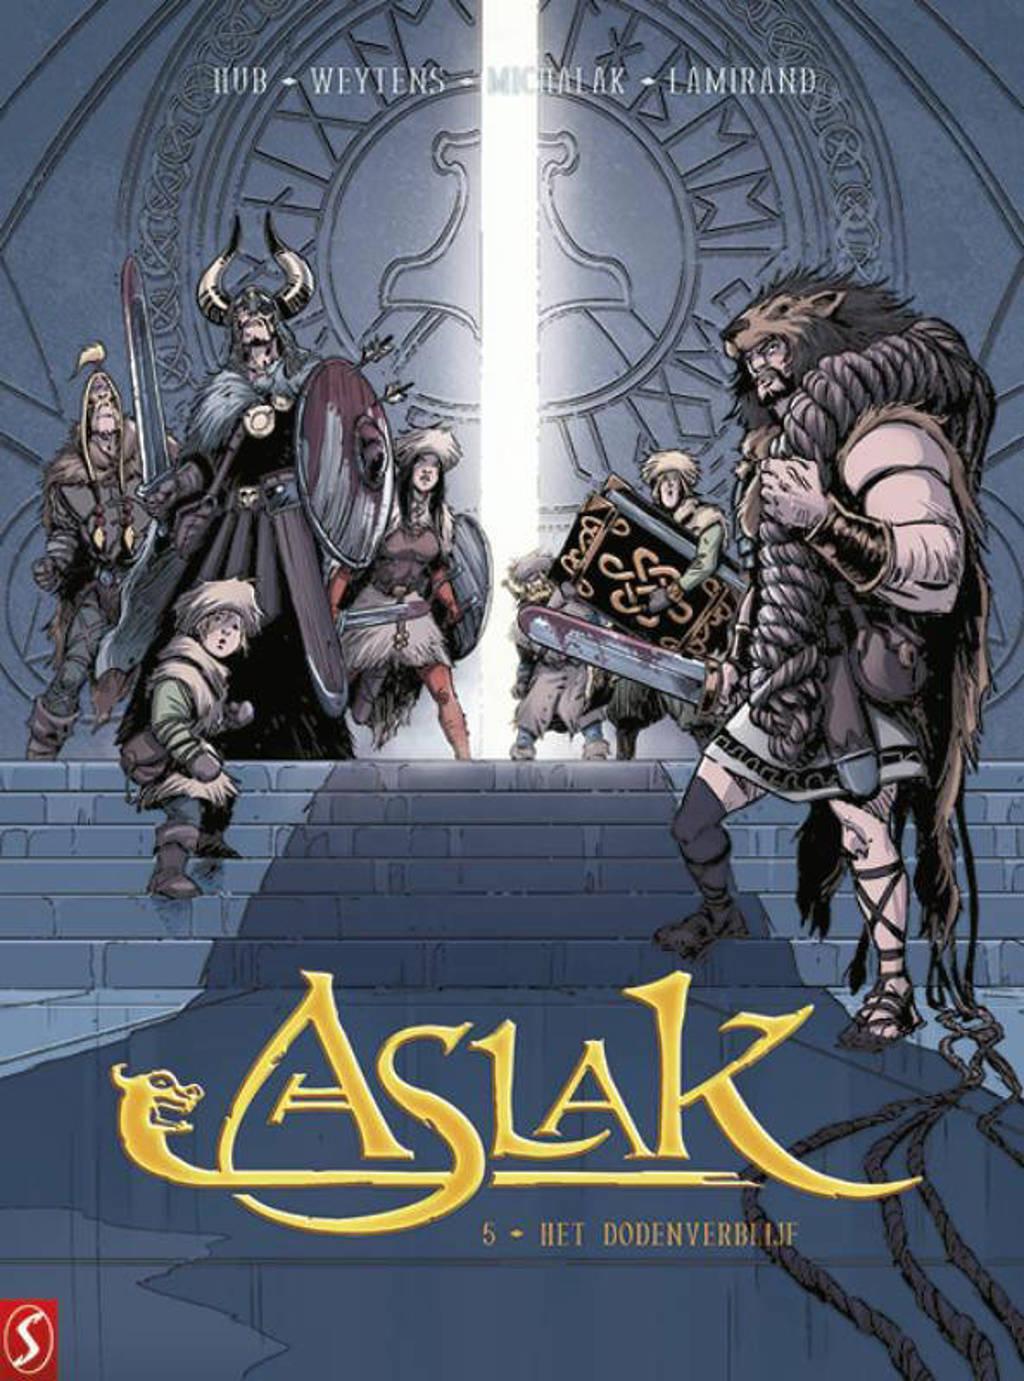 Aslak: Het dodenverblijf - Emmanuel Michalak, Fred Weytens en Hub